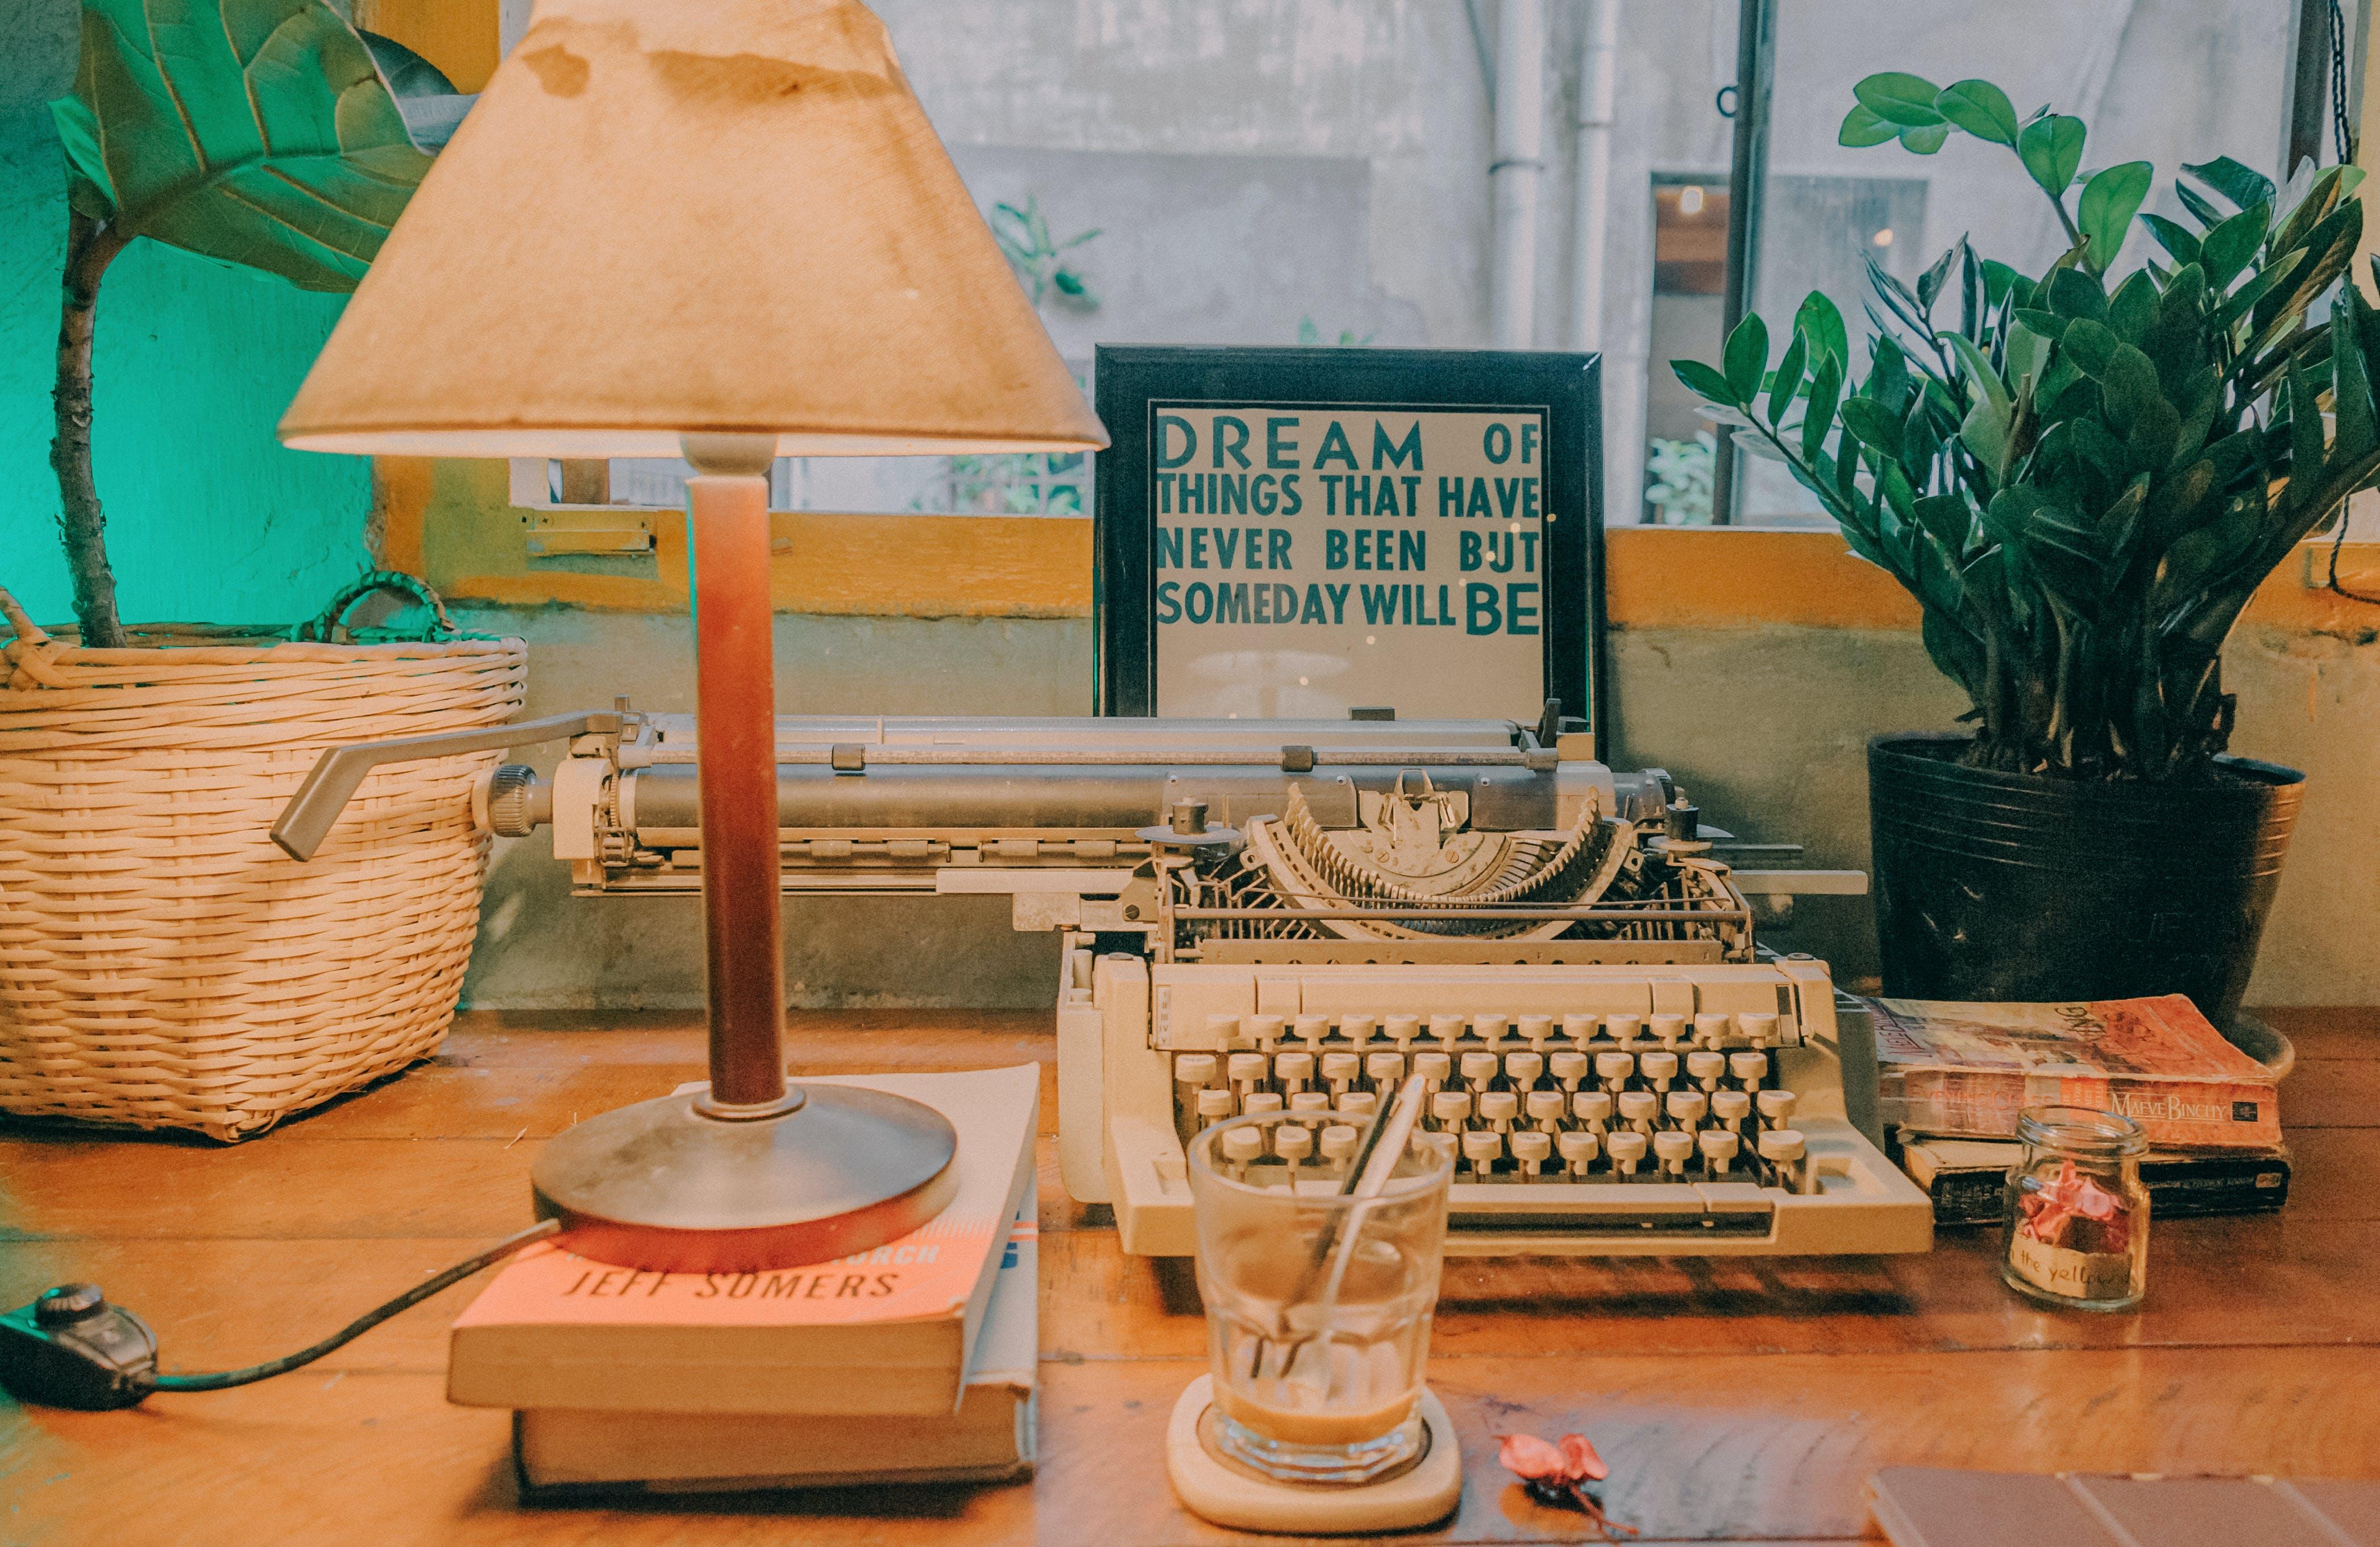 Kostnadsfri bild av antik, inomhus, lampa, retro